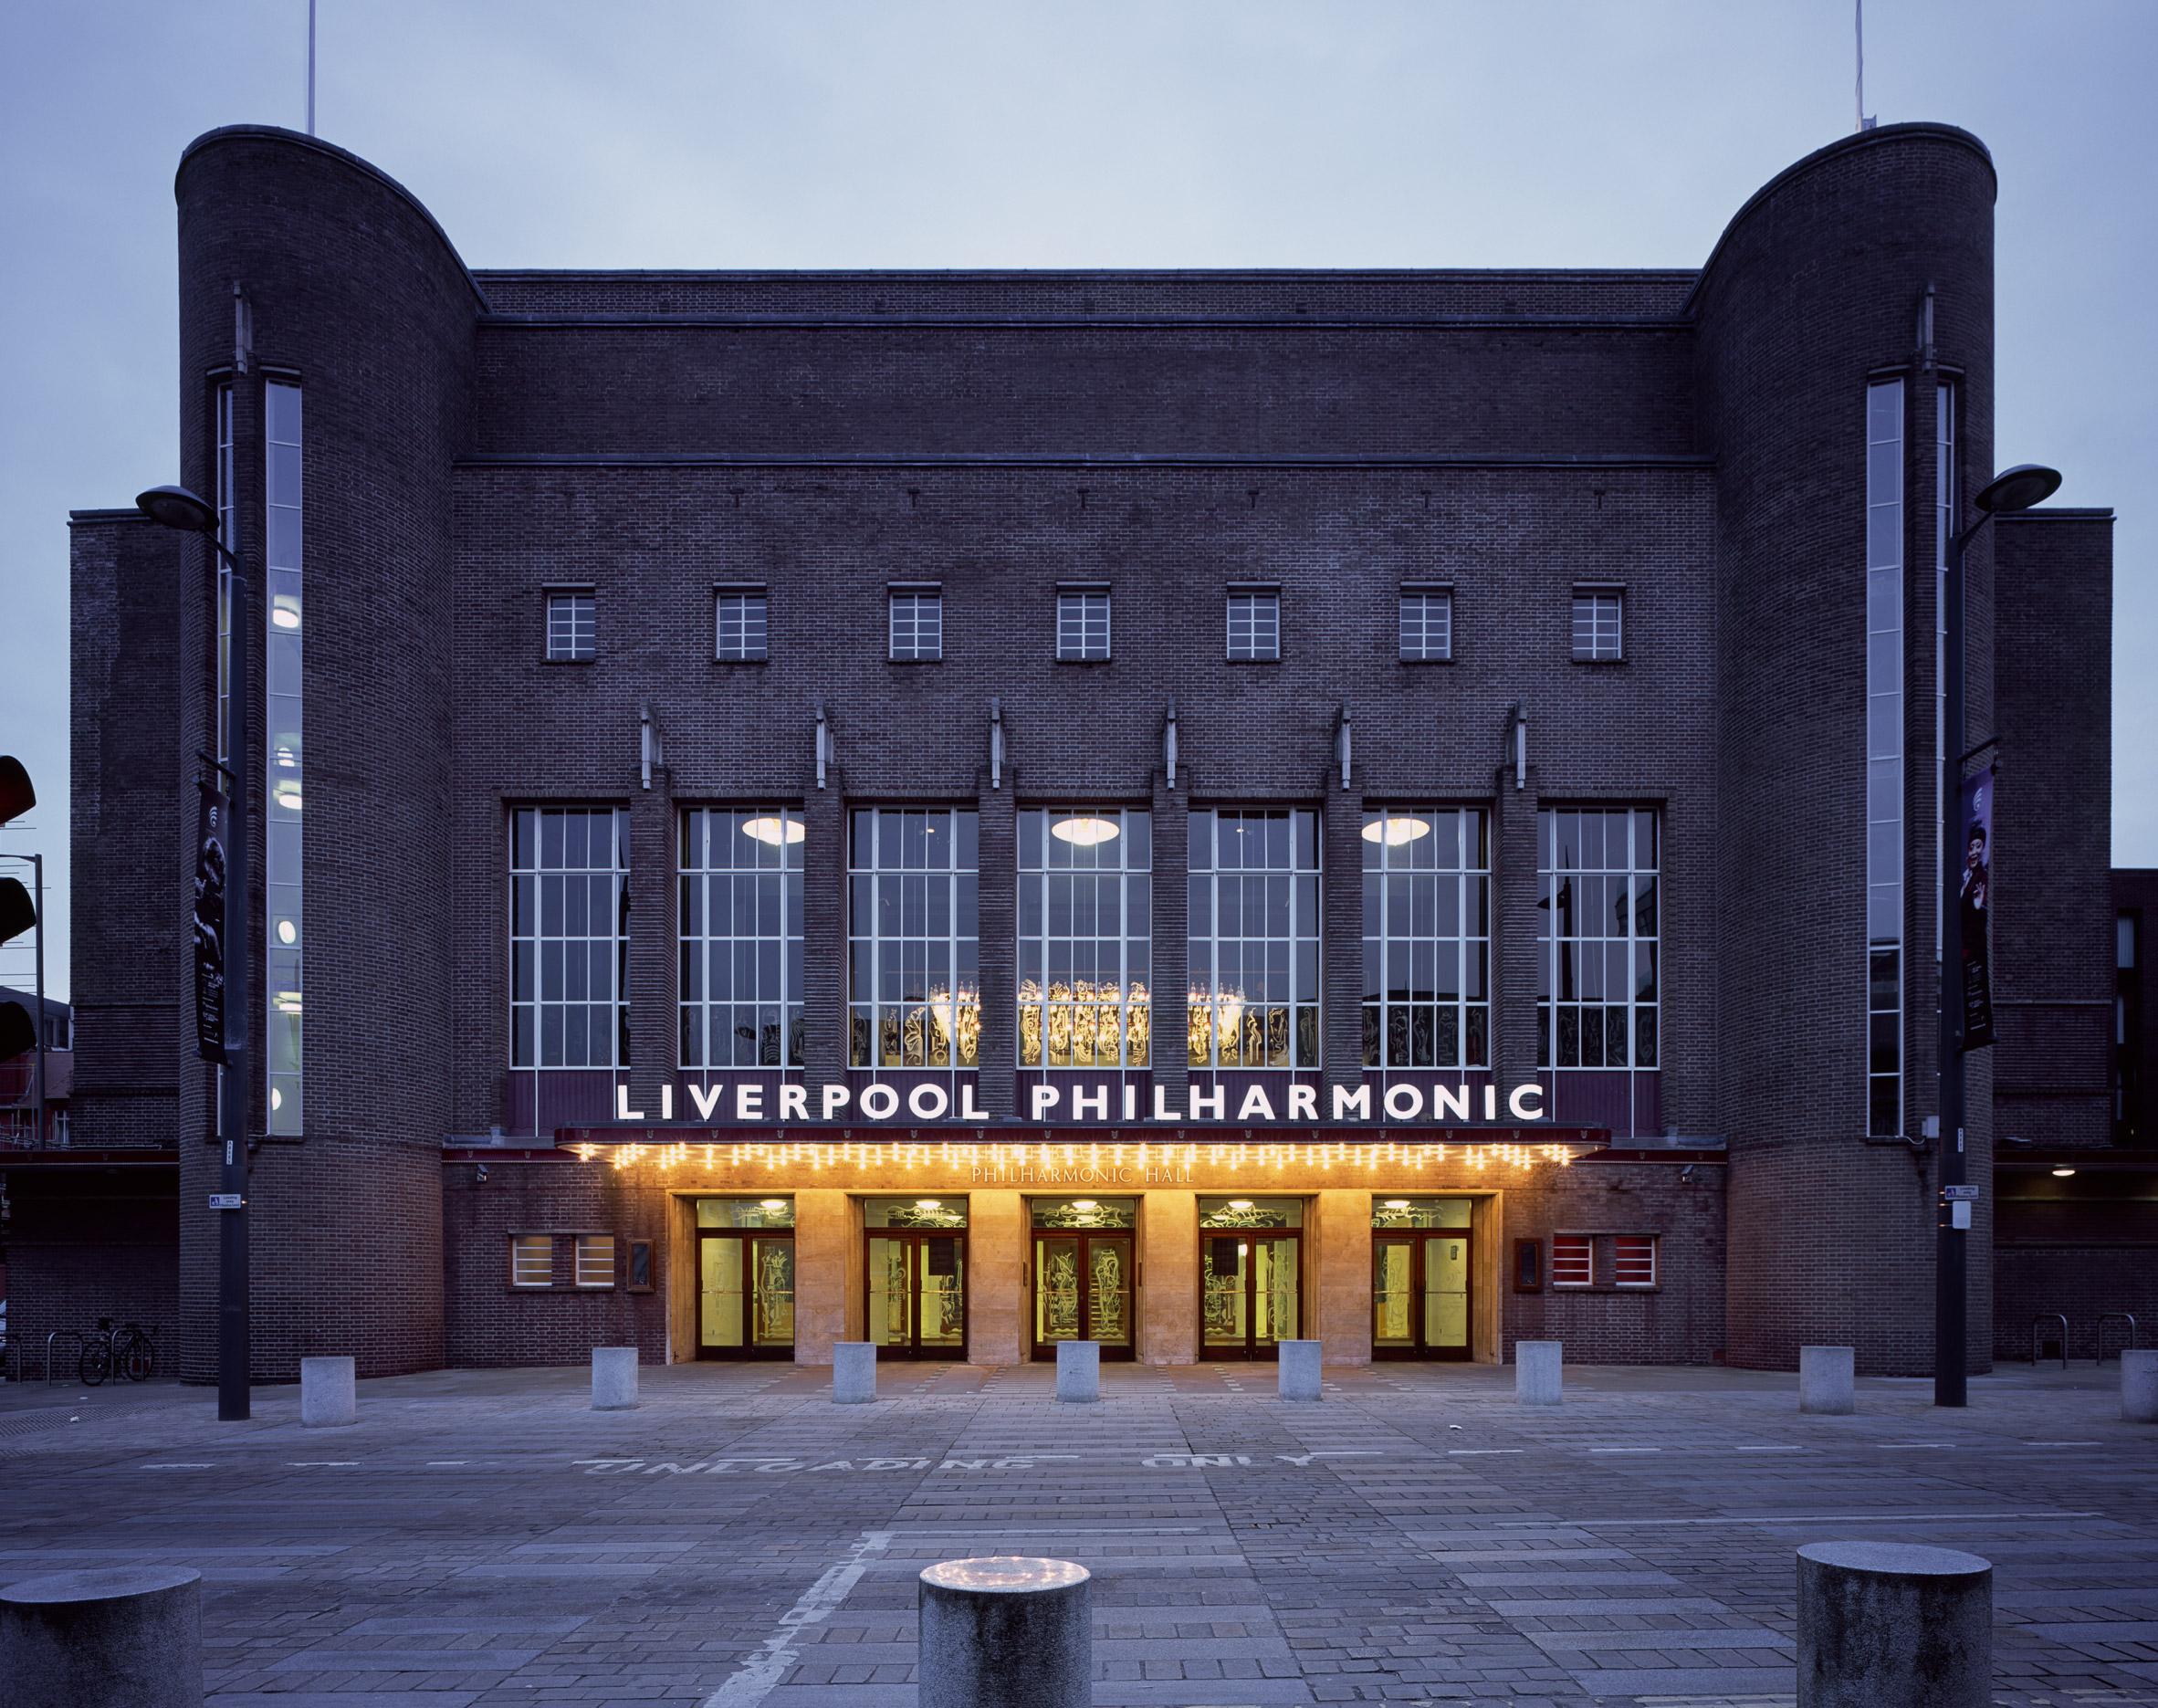 Caruso St John's Liverpool Philharmonic Hall refurbishment revives an art deco masterpiece